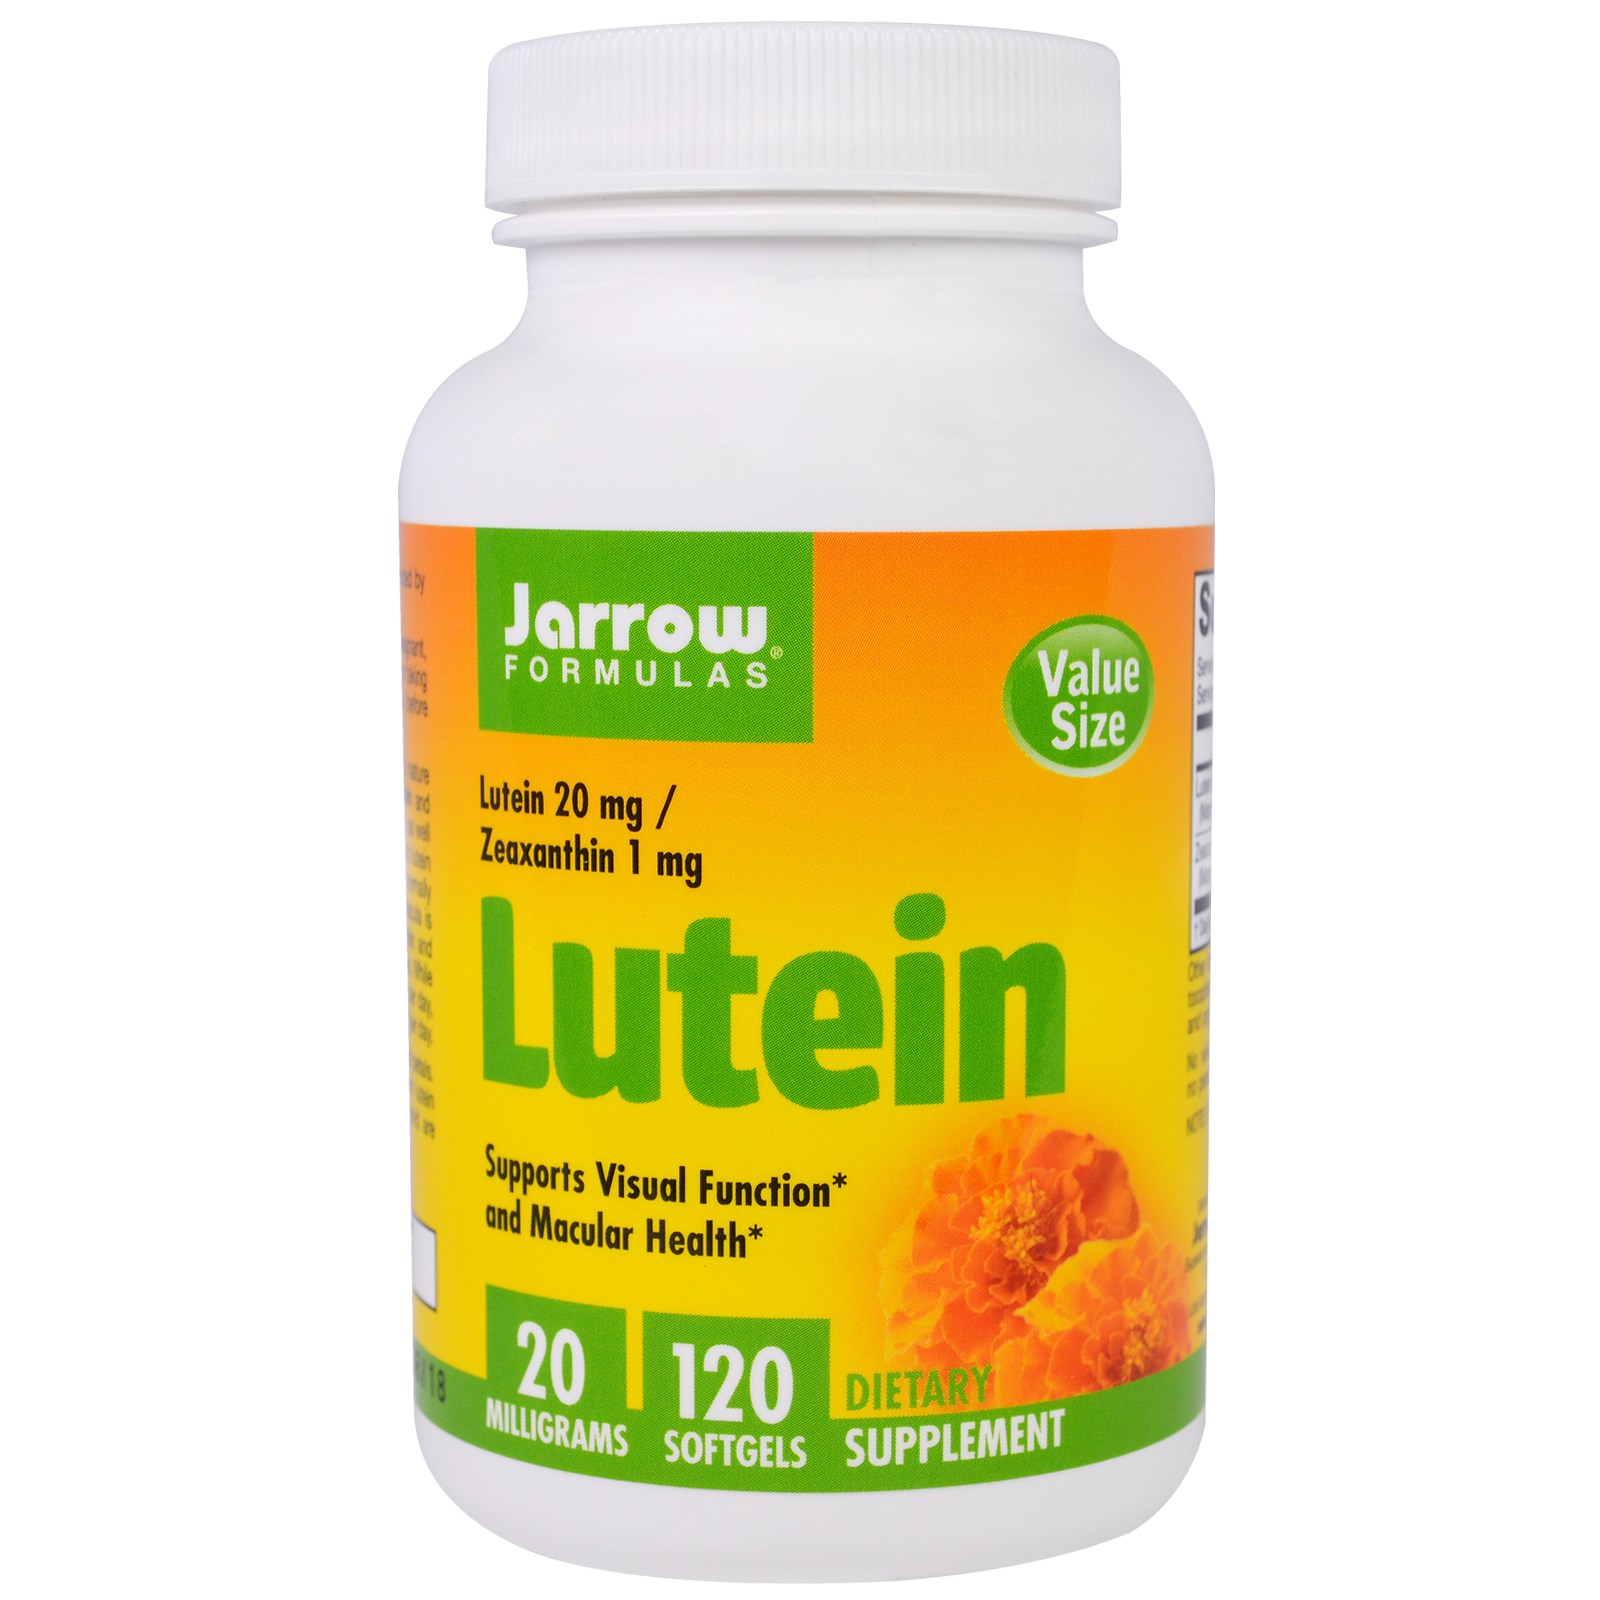 Image of Lutein 20 mg (120 Softgels) - Jarrow Formulas 0790011120353